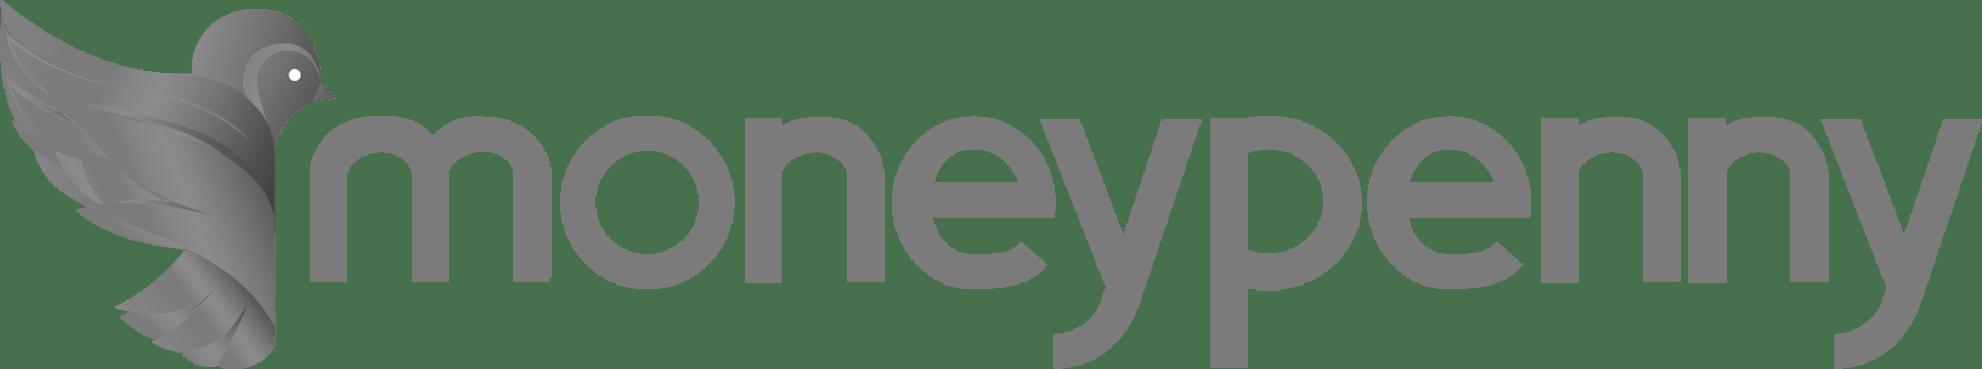 Moneypenny integration